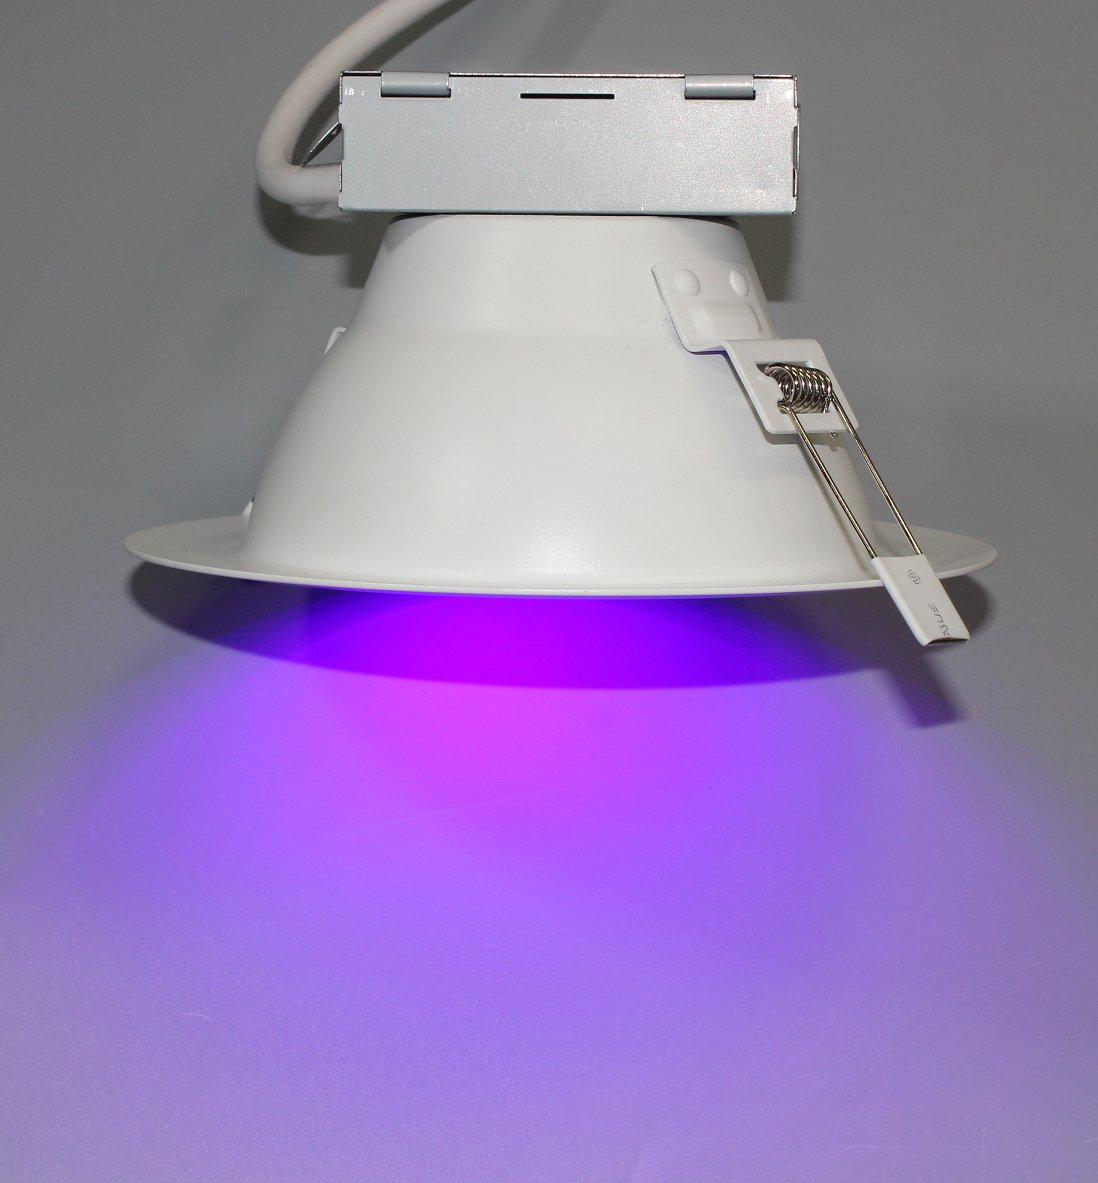 405nm Germicidal UVA Downlight